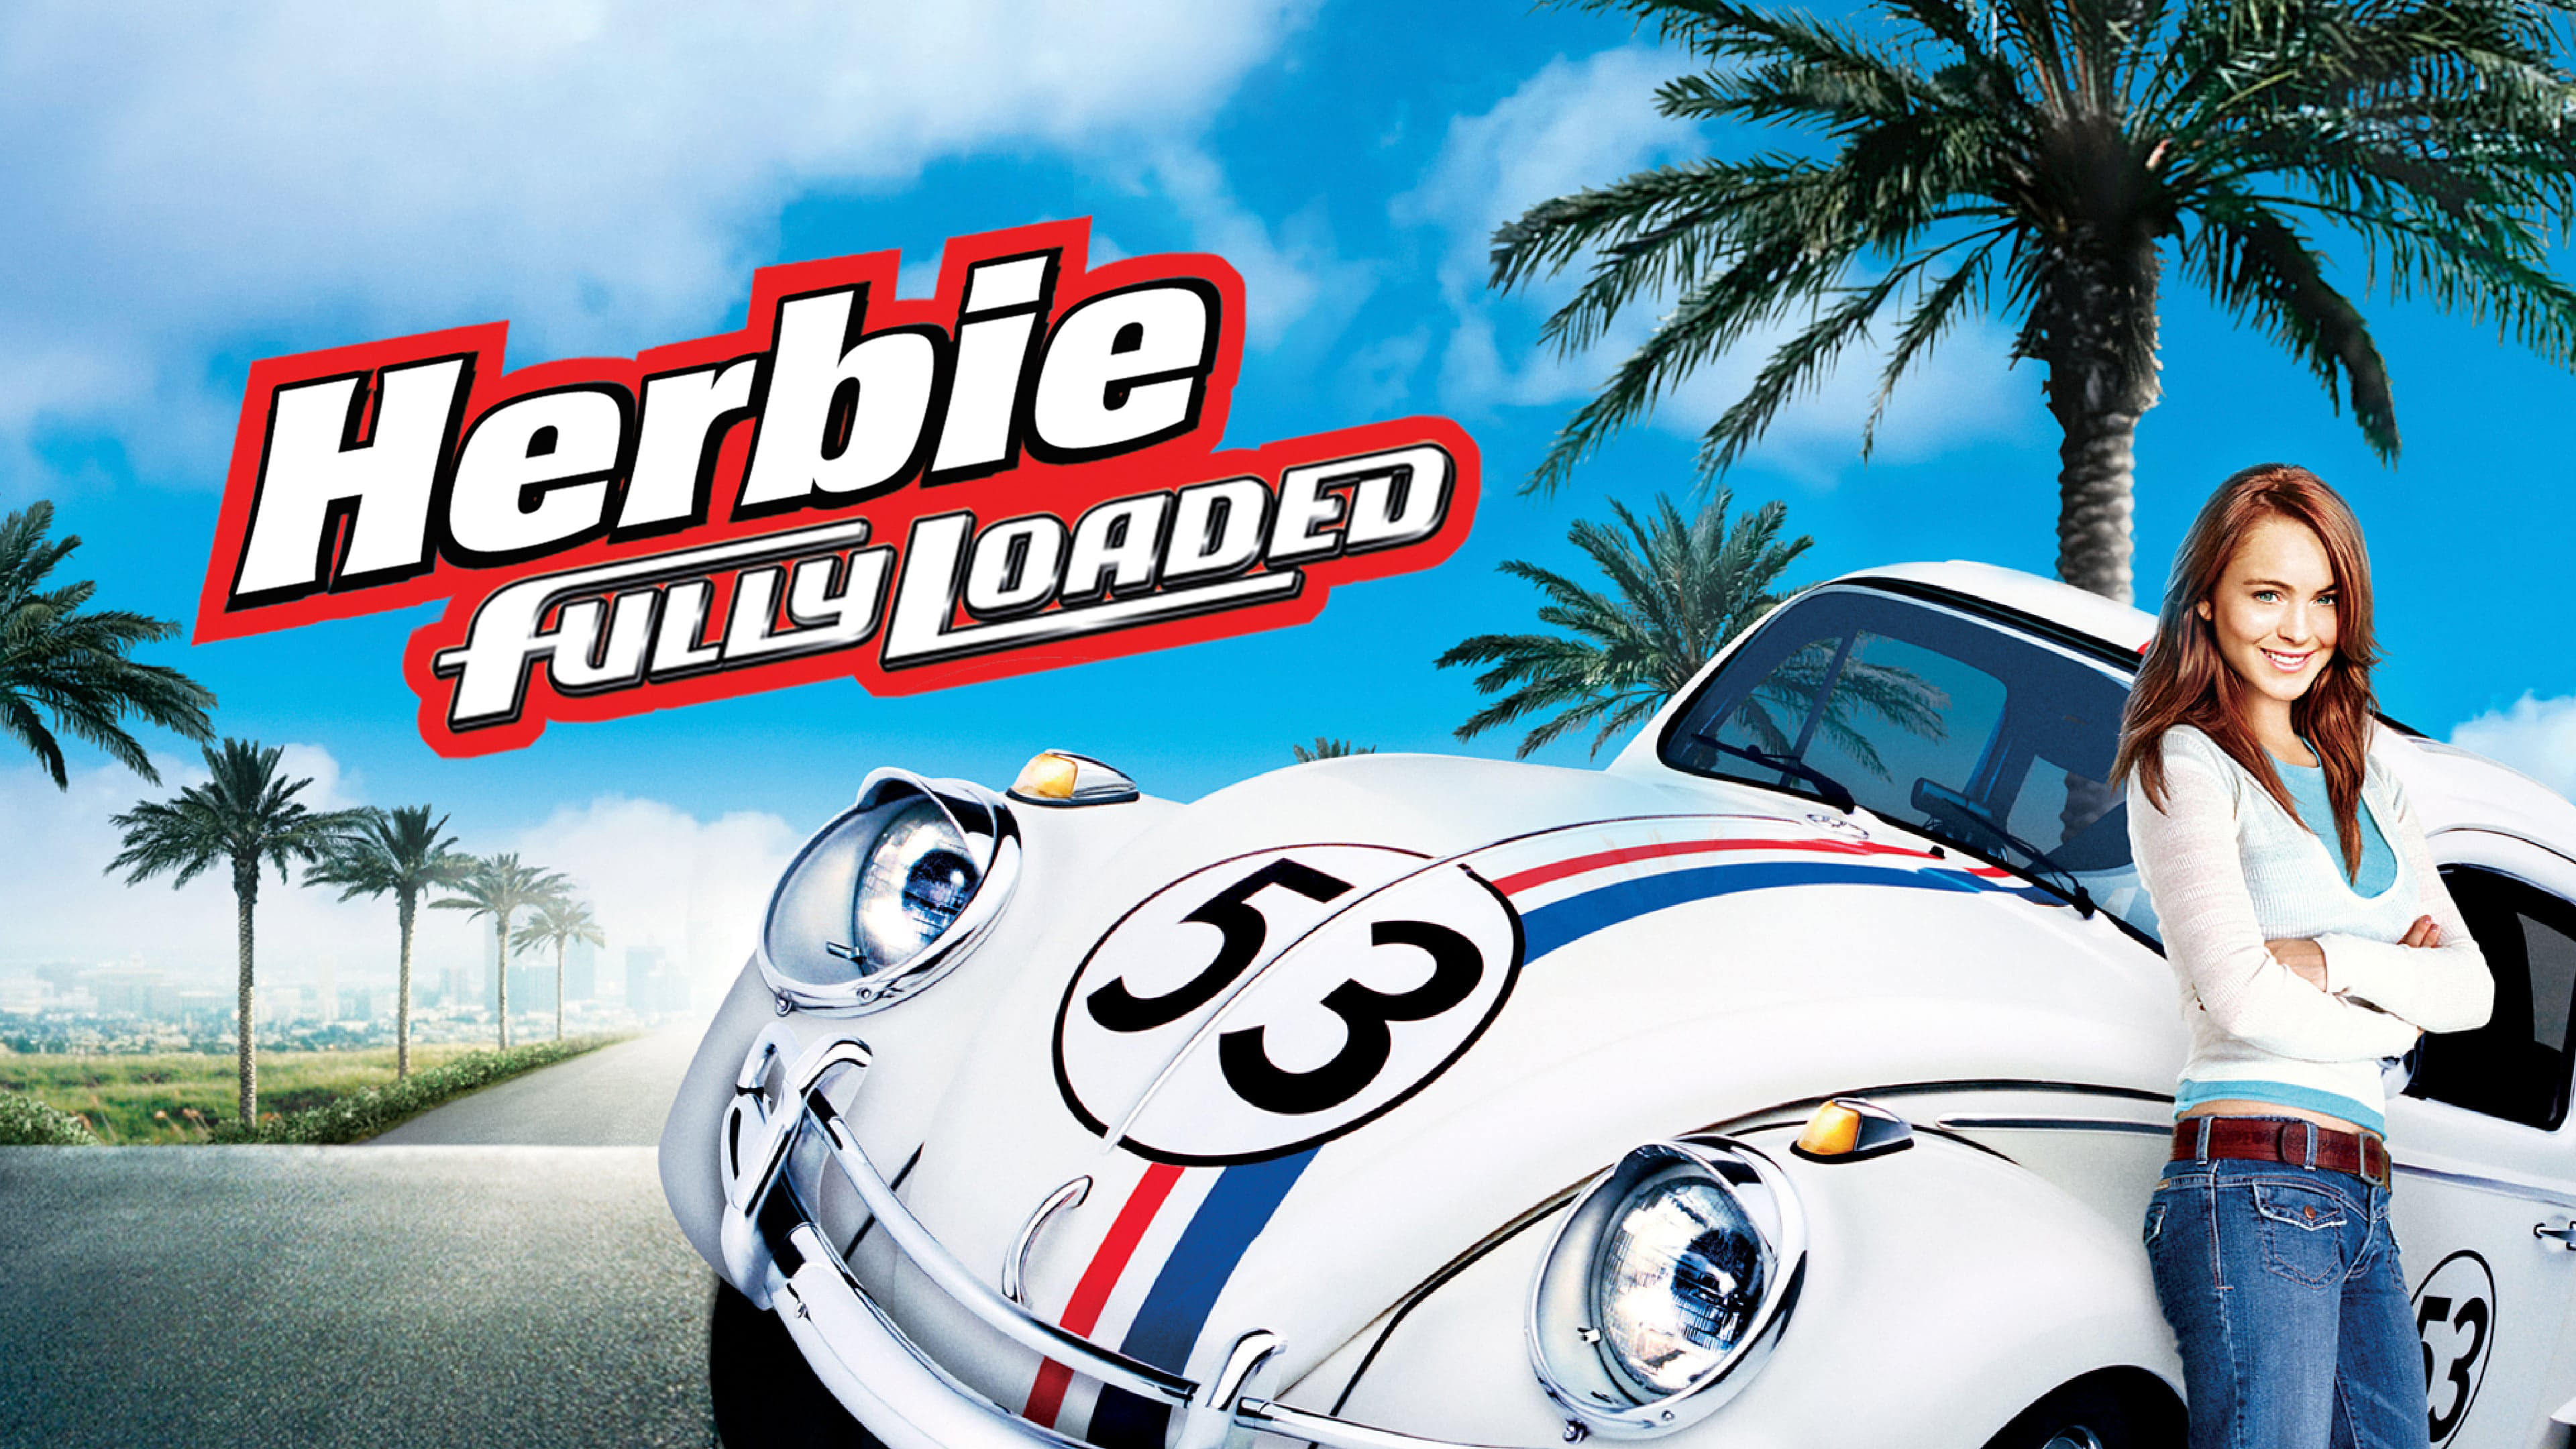 Herbie: A toda marcha